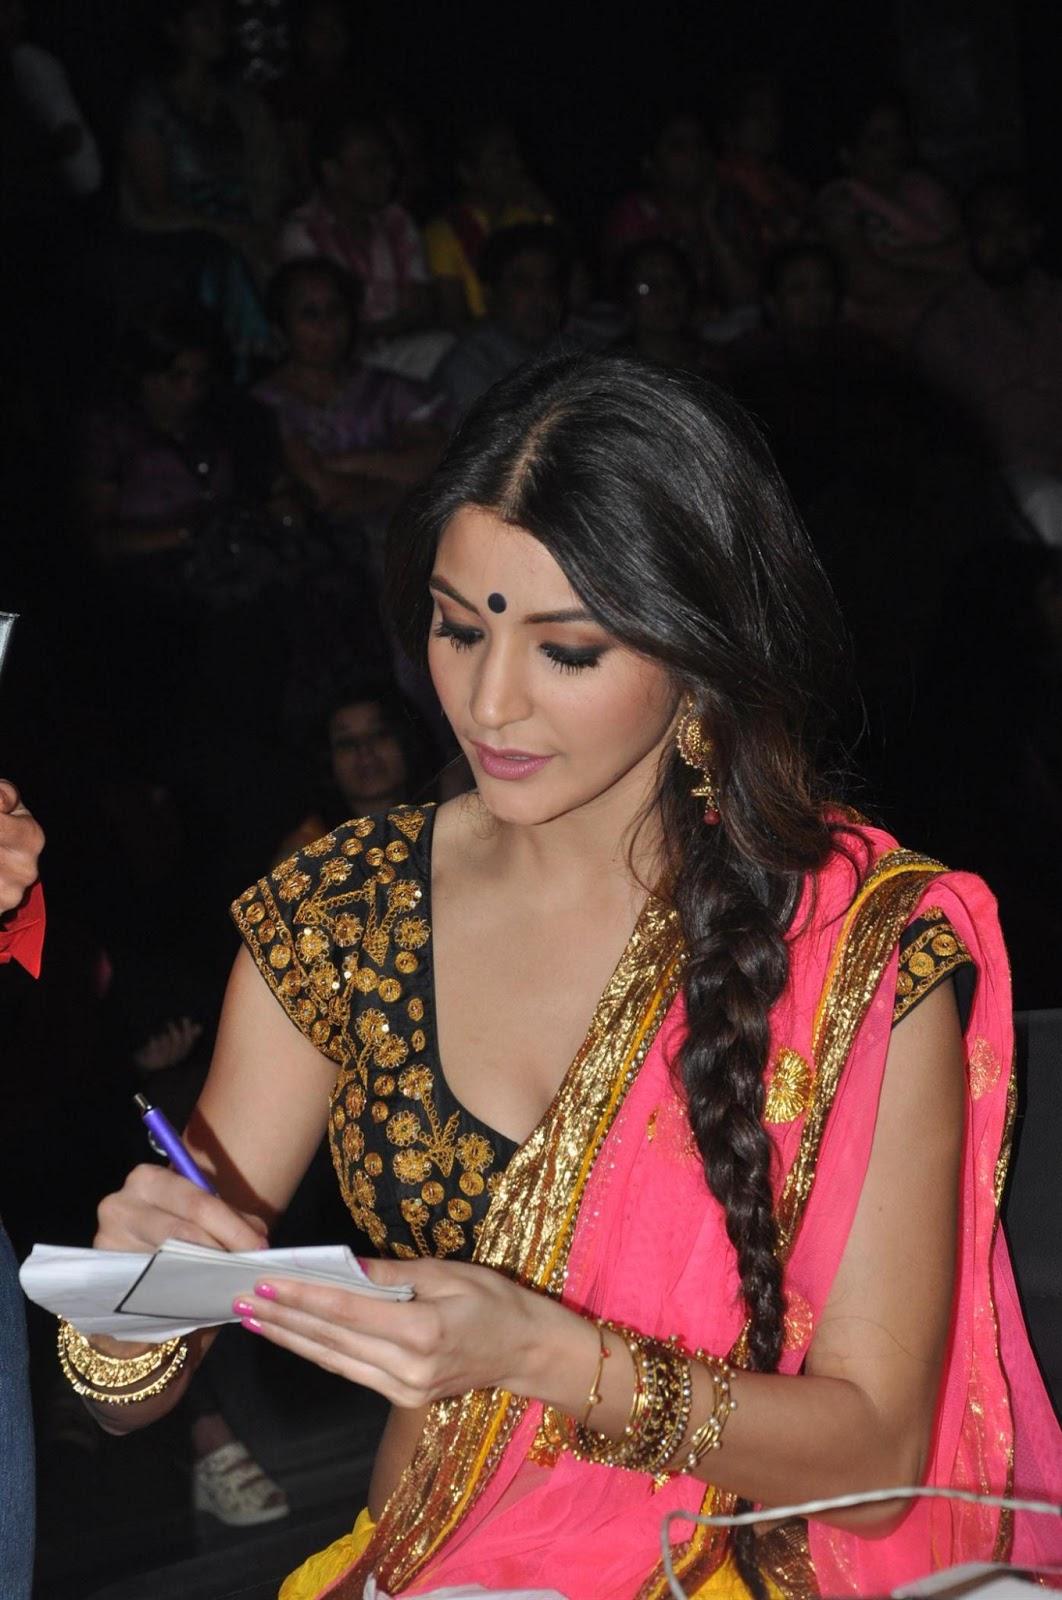 Anushka sharma and imran khan promoting matru ki bijlee ka mando on nach baliya.